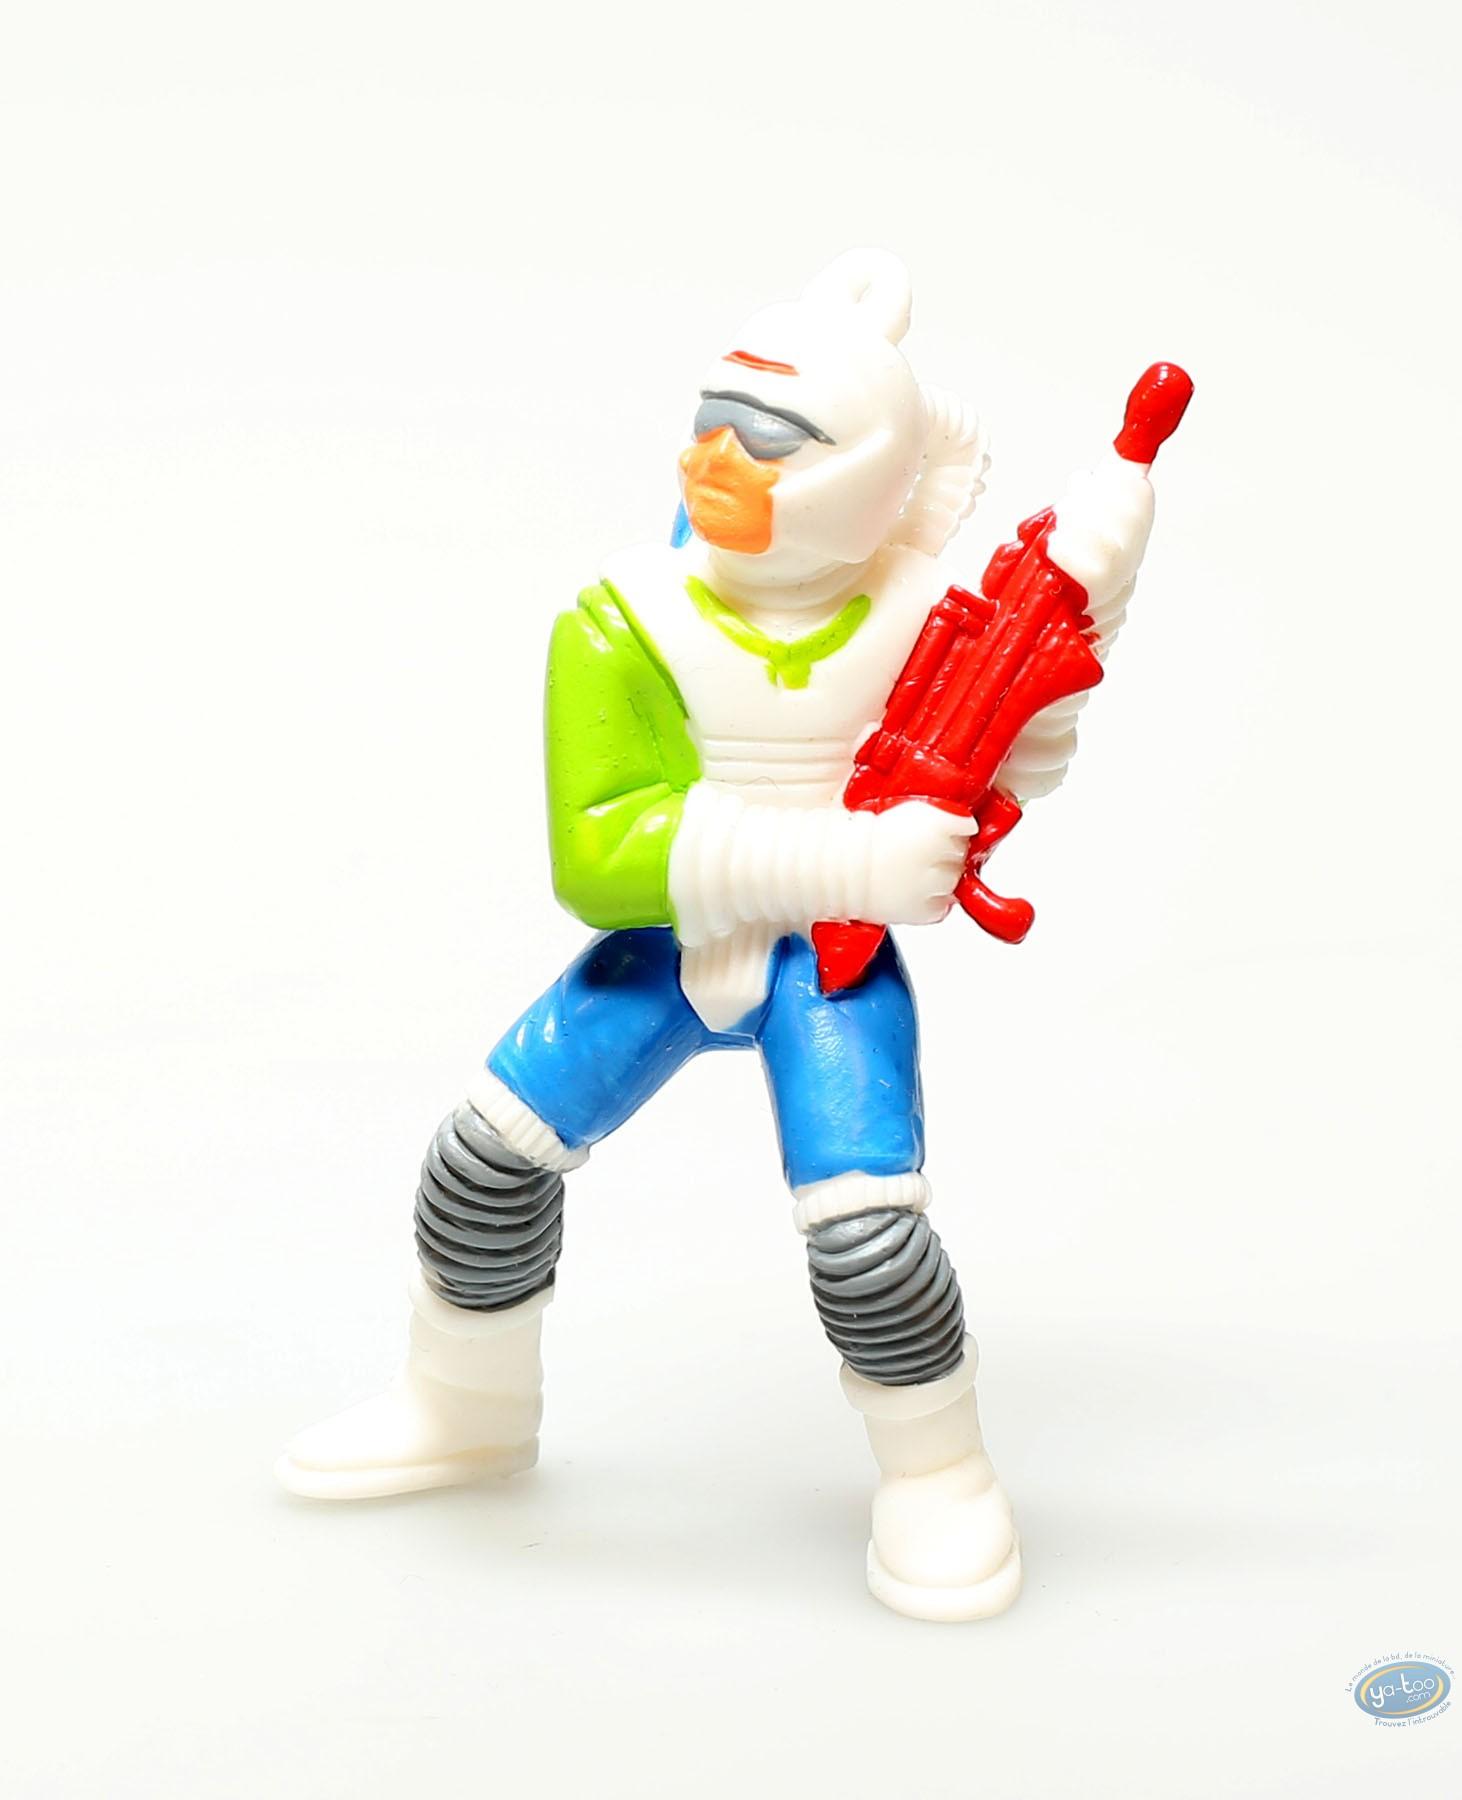 Plastic Figurine, Plastic figure, Orange figure with red gun